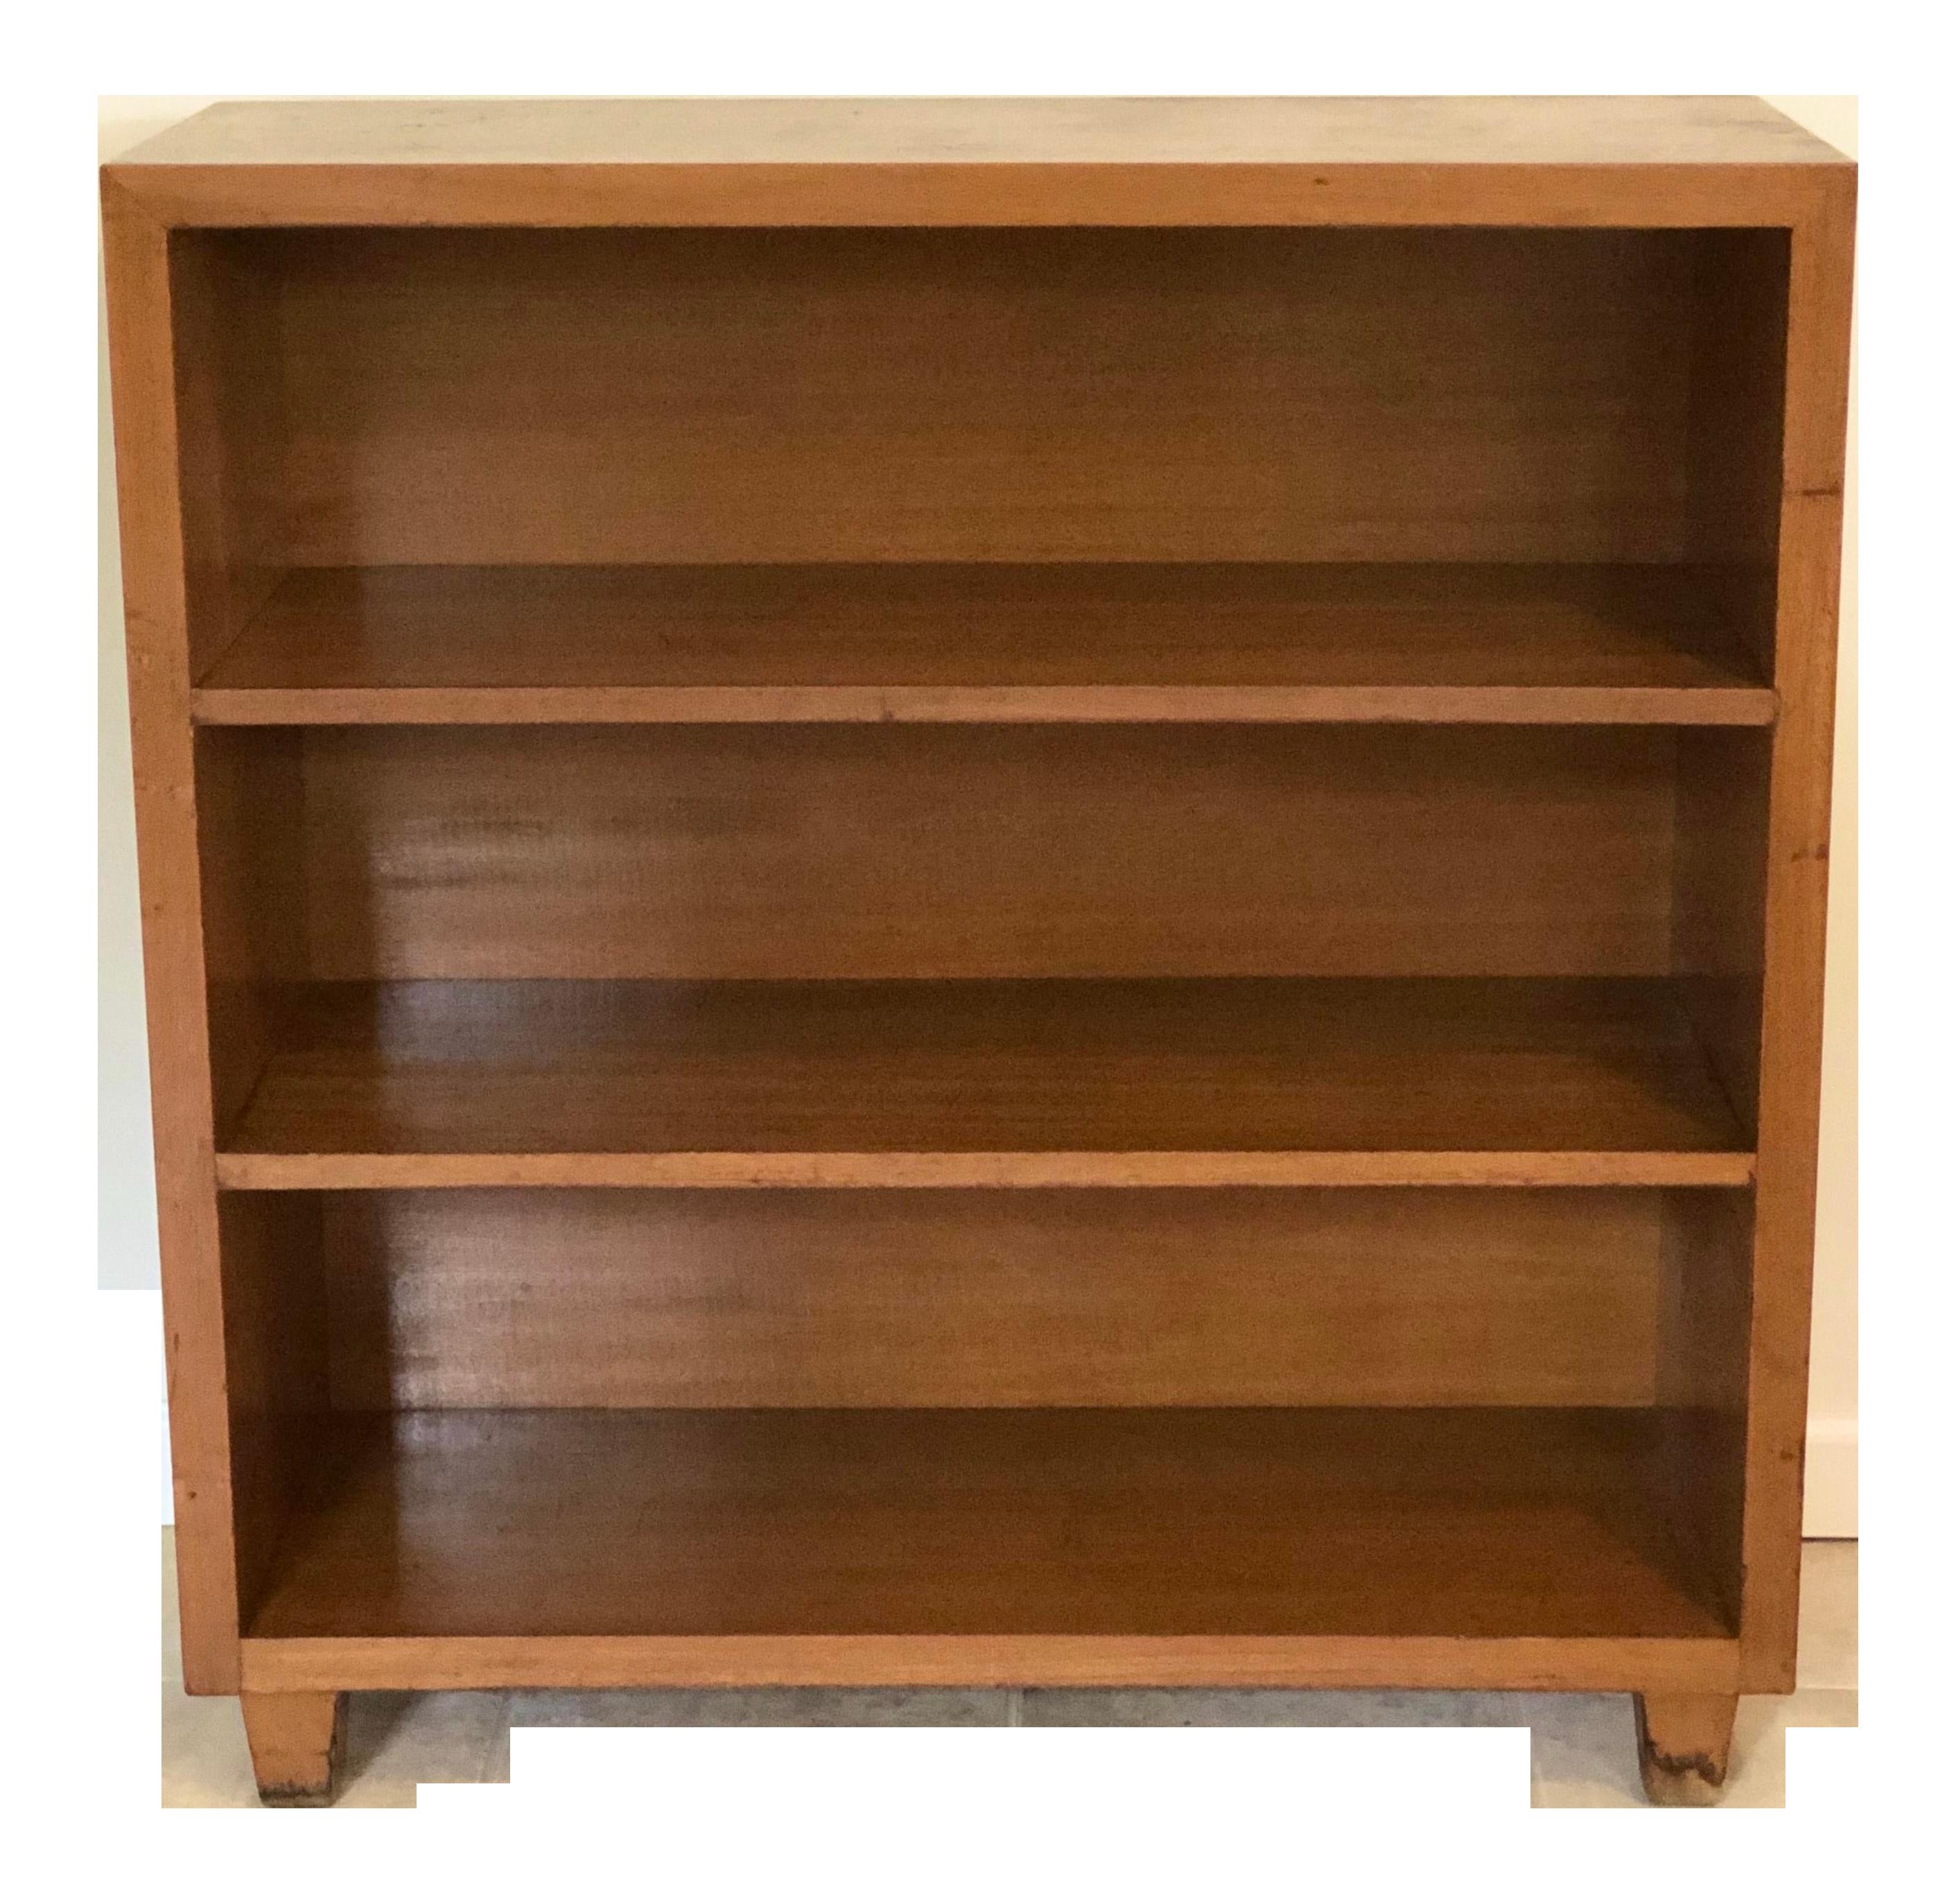 Image of: 1950s Mid Century Modern Furniture Blonde Mahogany Bookcase Chairish